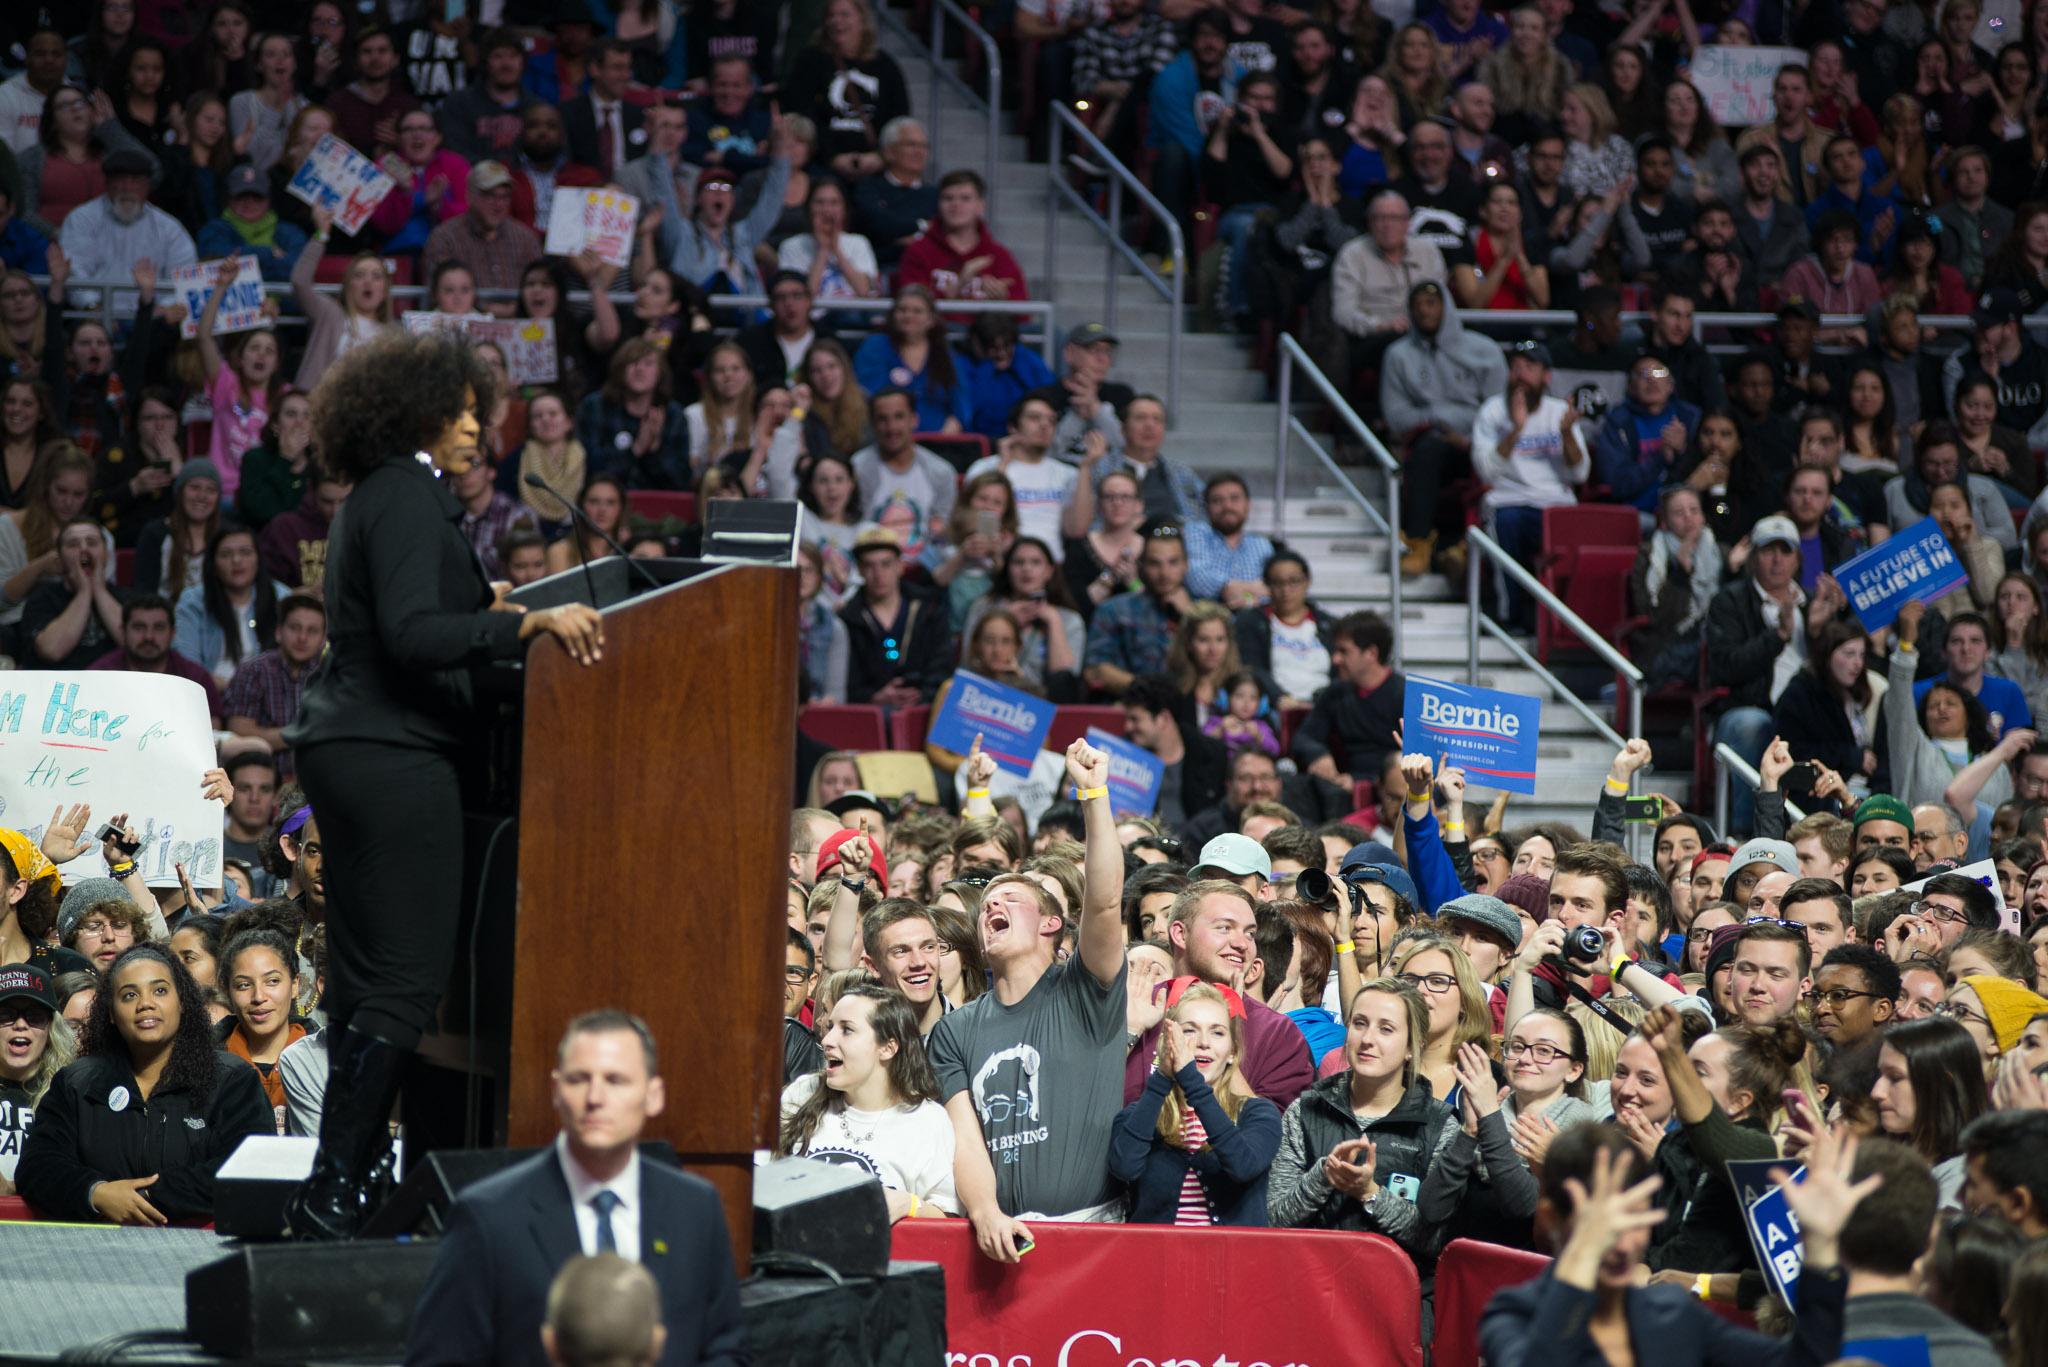 Bernie-Sanders-Philadelphia-Jeremy-Jeziorski-2016-04-06-web-15.jpg